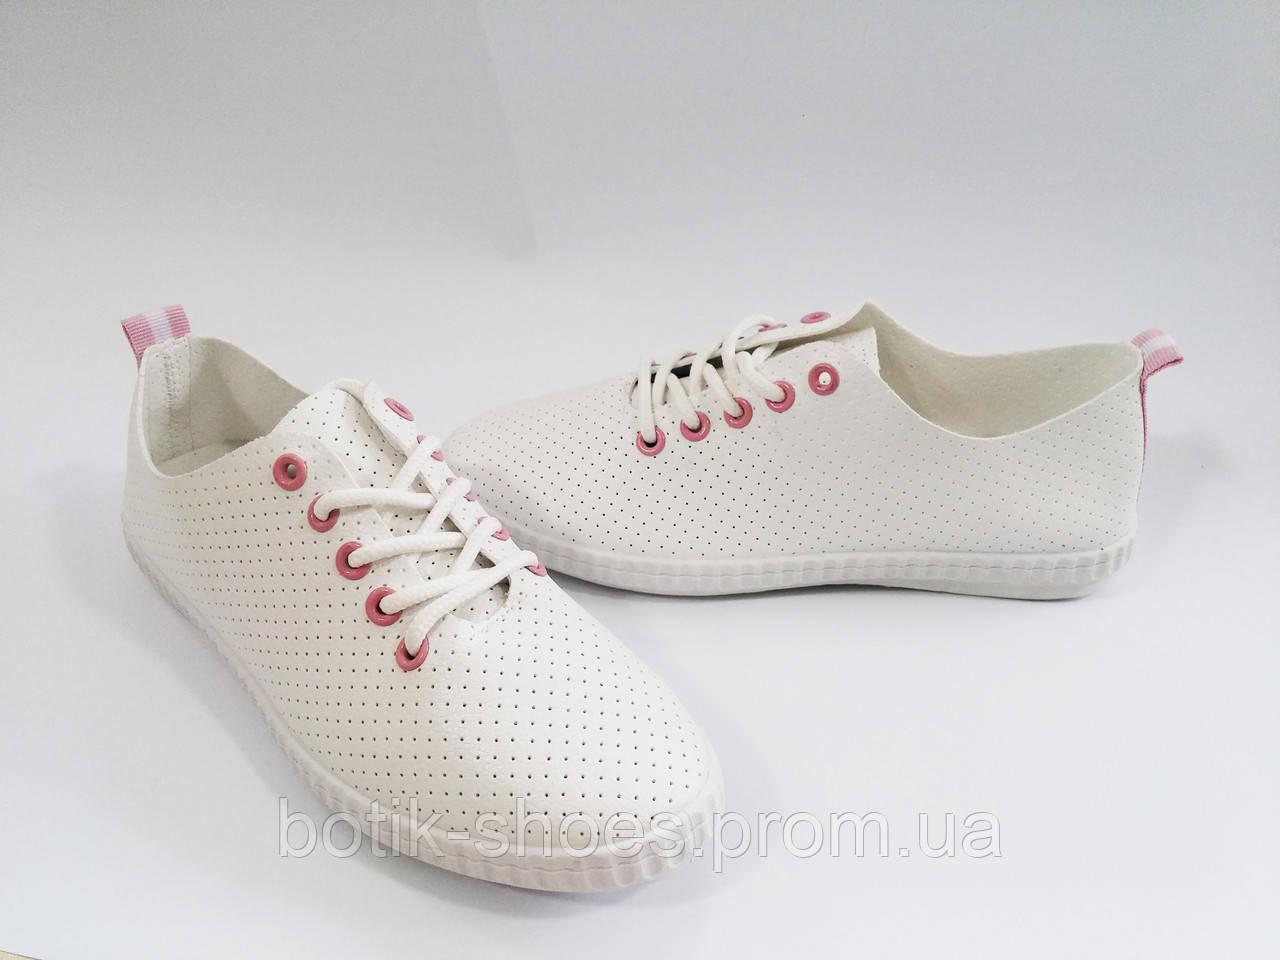 cf434f905 Кроссовки женские Vices. Купить женские кроссовки, кеды белые на ...